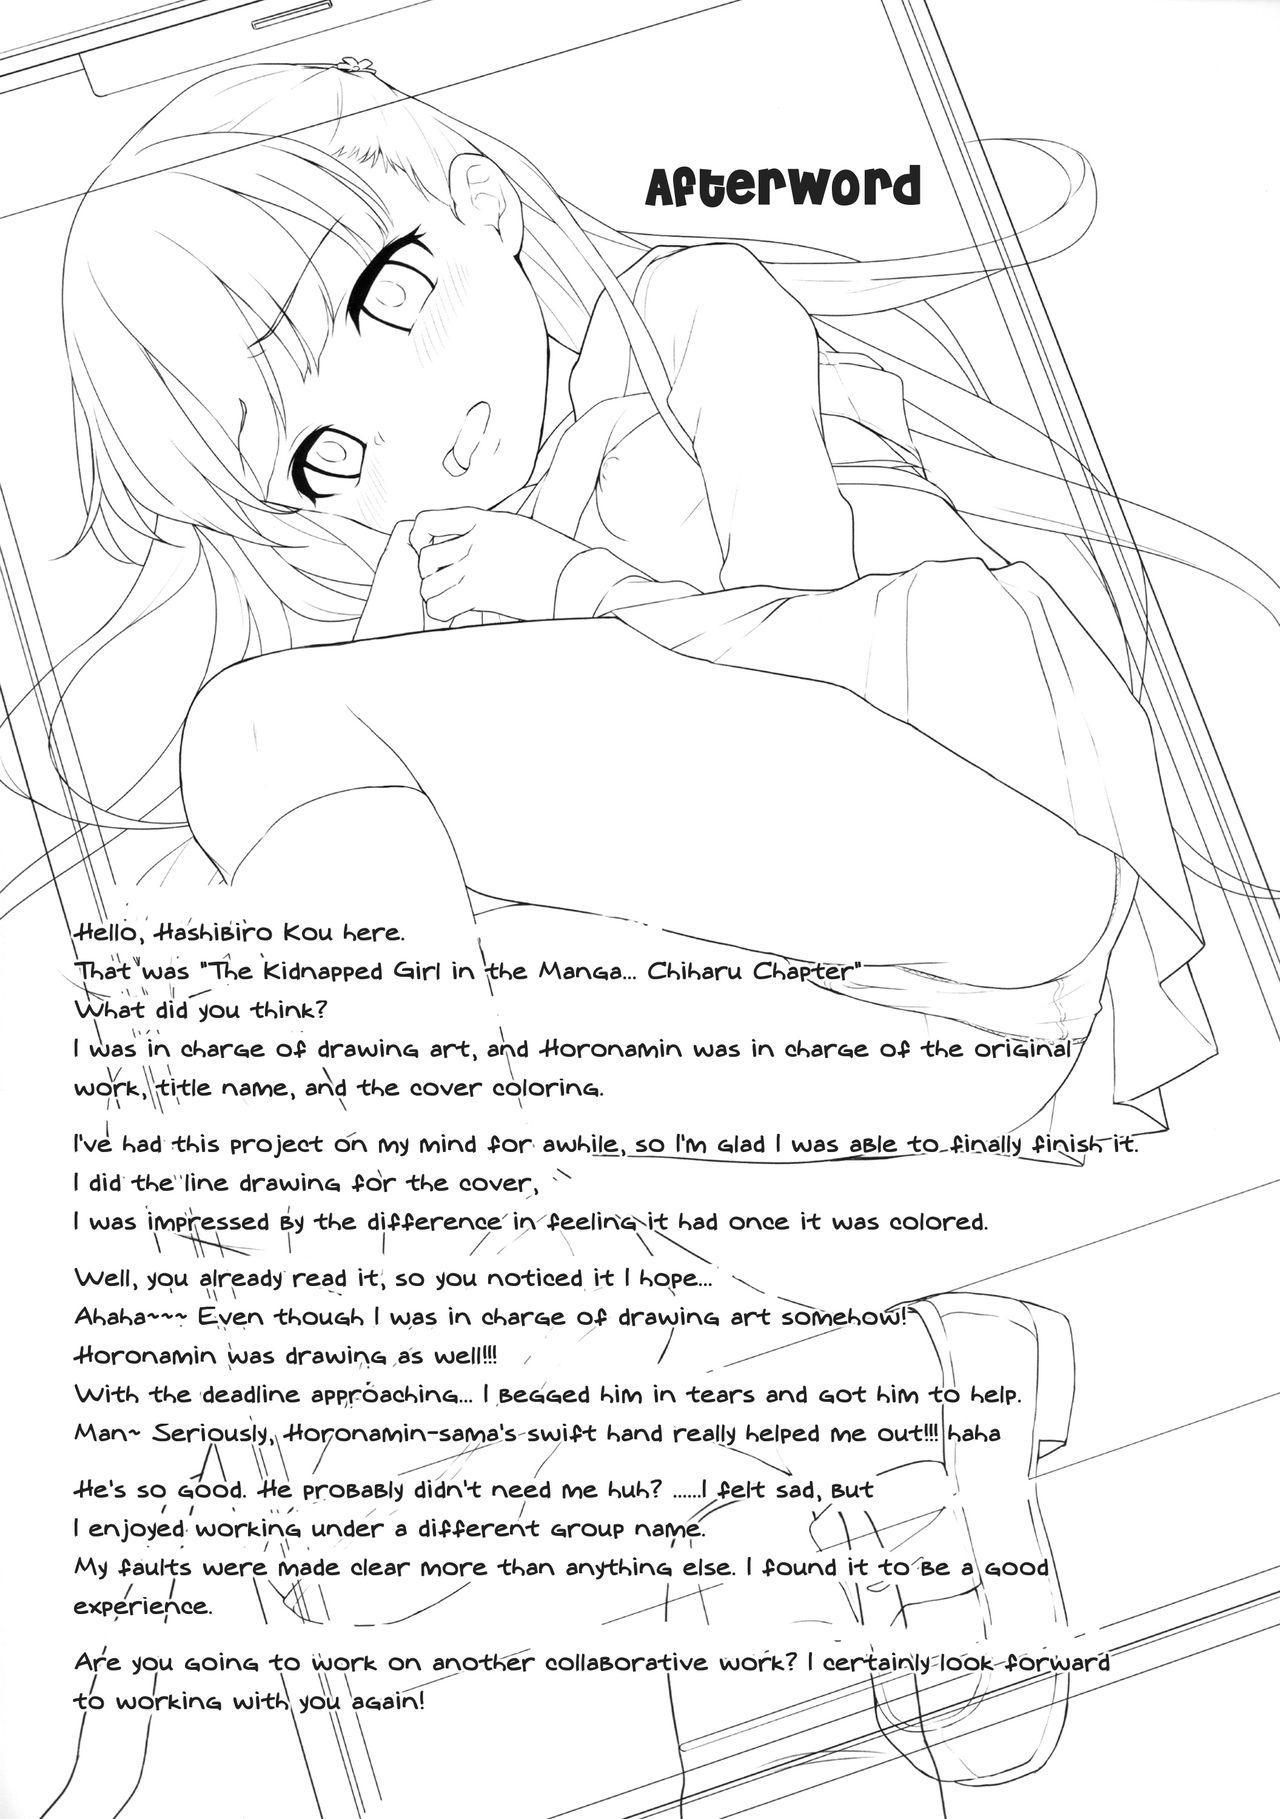 Rachirare Shoujo wa, Manga no Naka de __. Koharu Hen | The Kidnapped Girl in the Manga... Chiharu Chapter 22